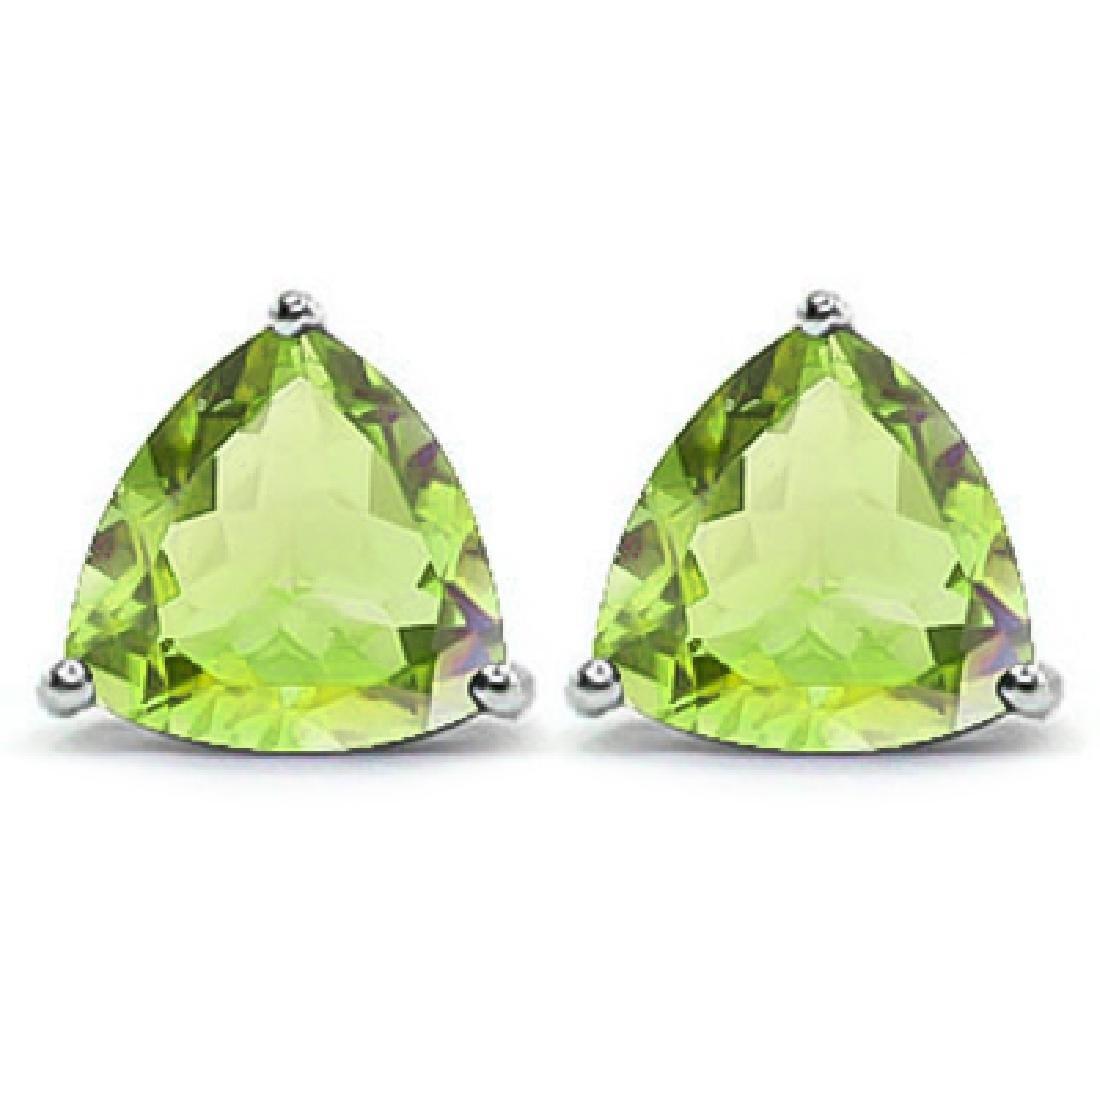 Trillion 1.5 CTW Peridot Stud Earrings in Platinum over